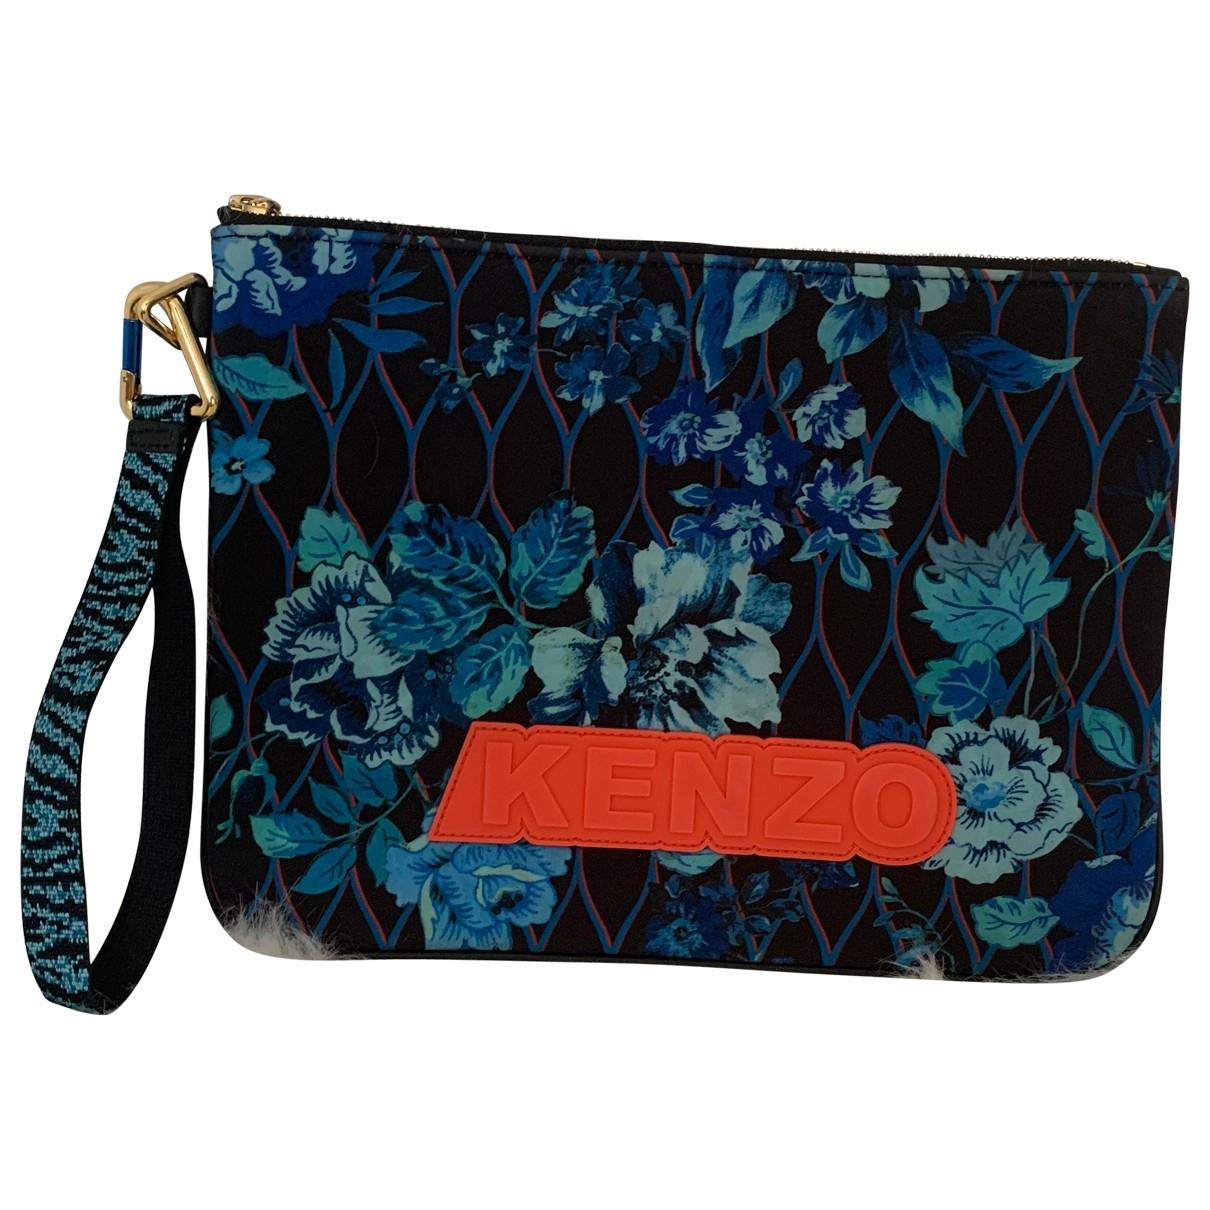 Kenzo X H&m - Pochette   pour femme - multicolore